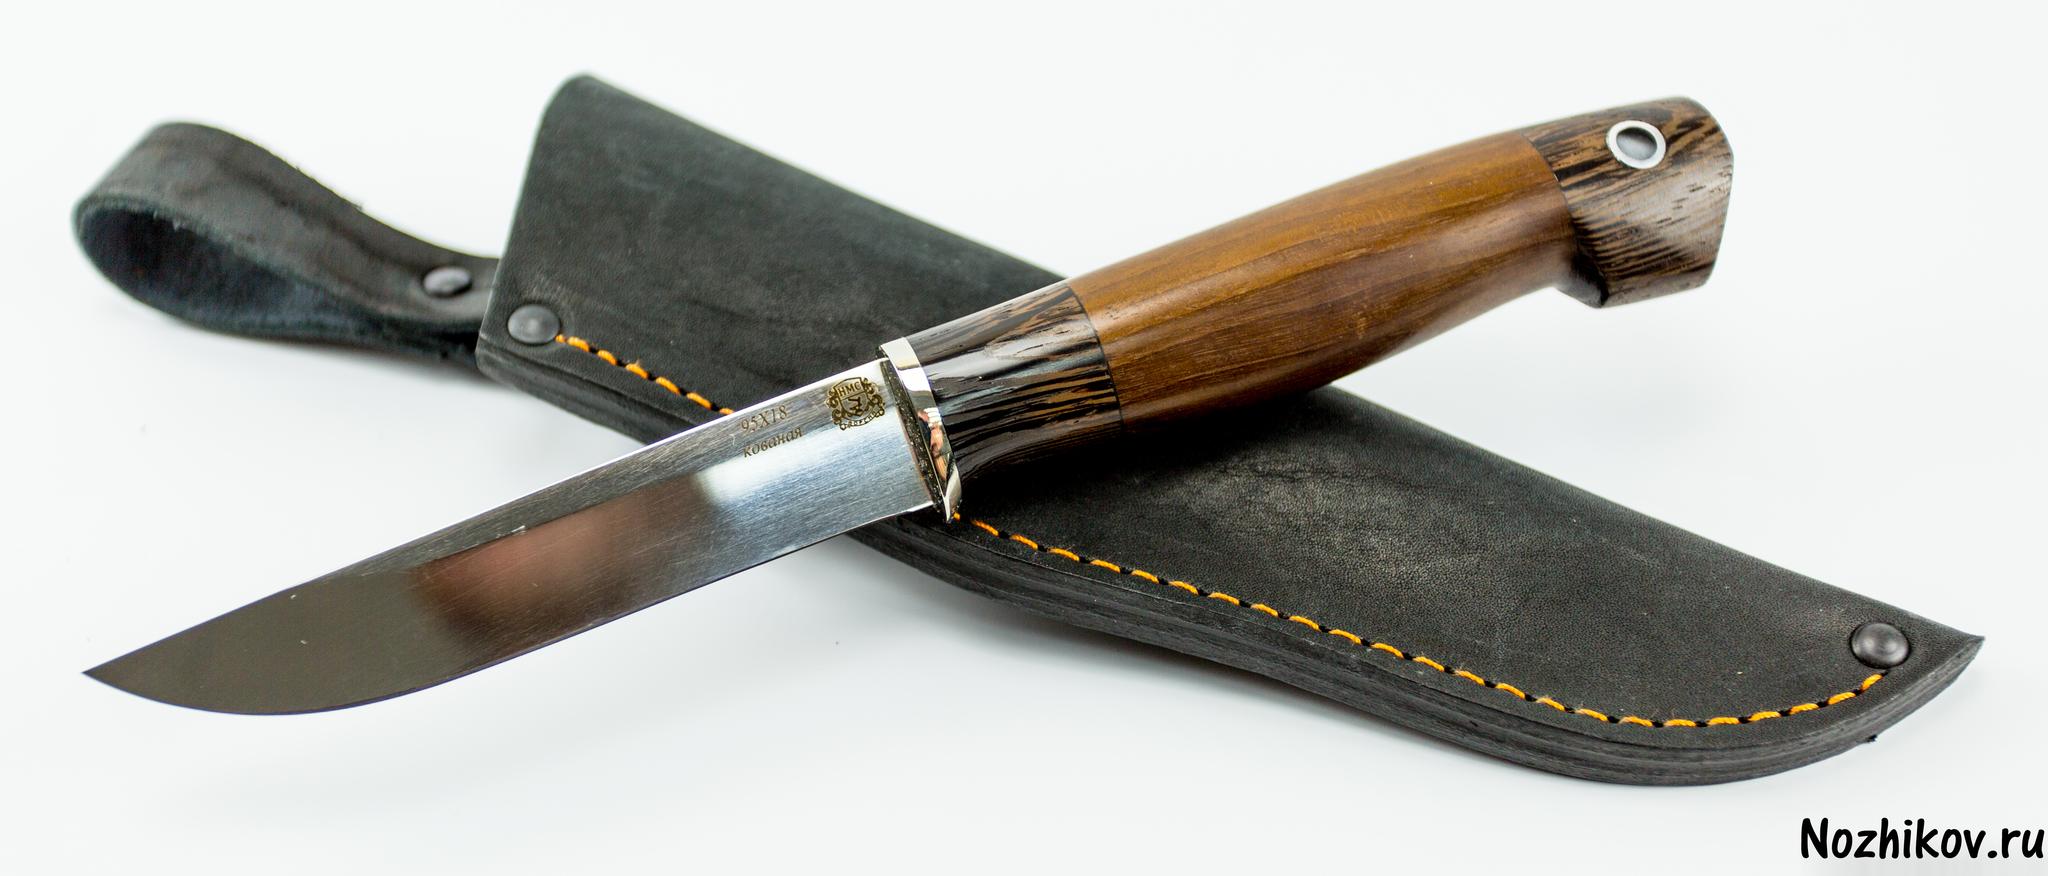 Фото 6 - Нож Финский, 95Х18 от Мастерская Сковородихина